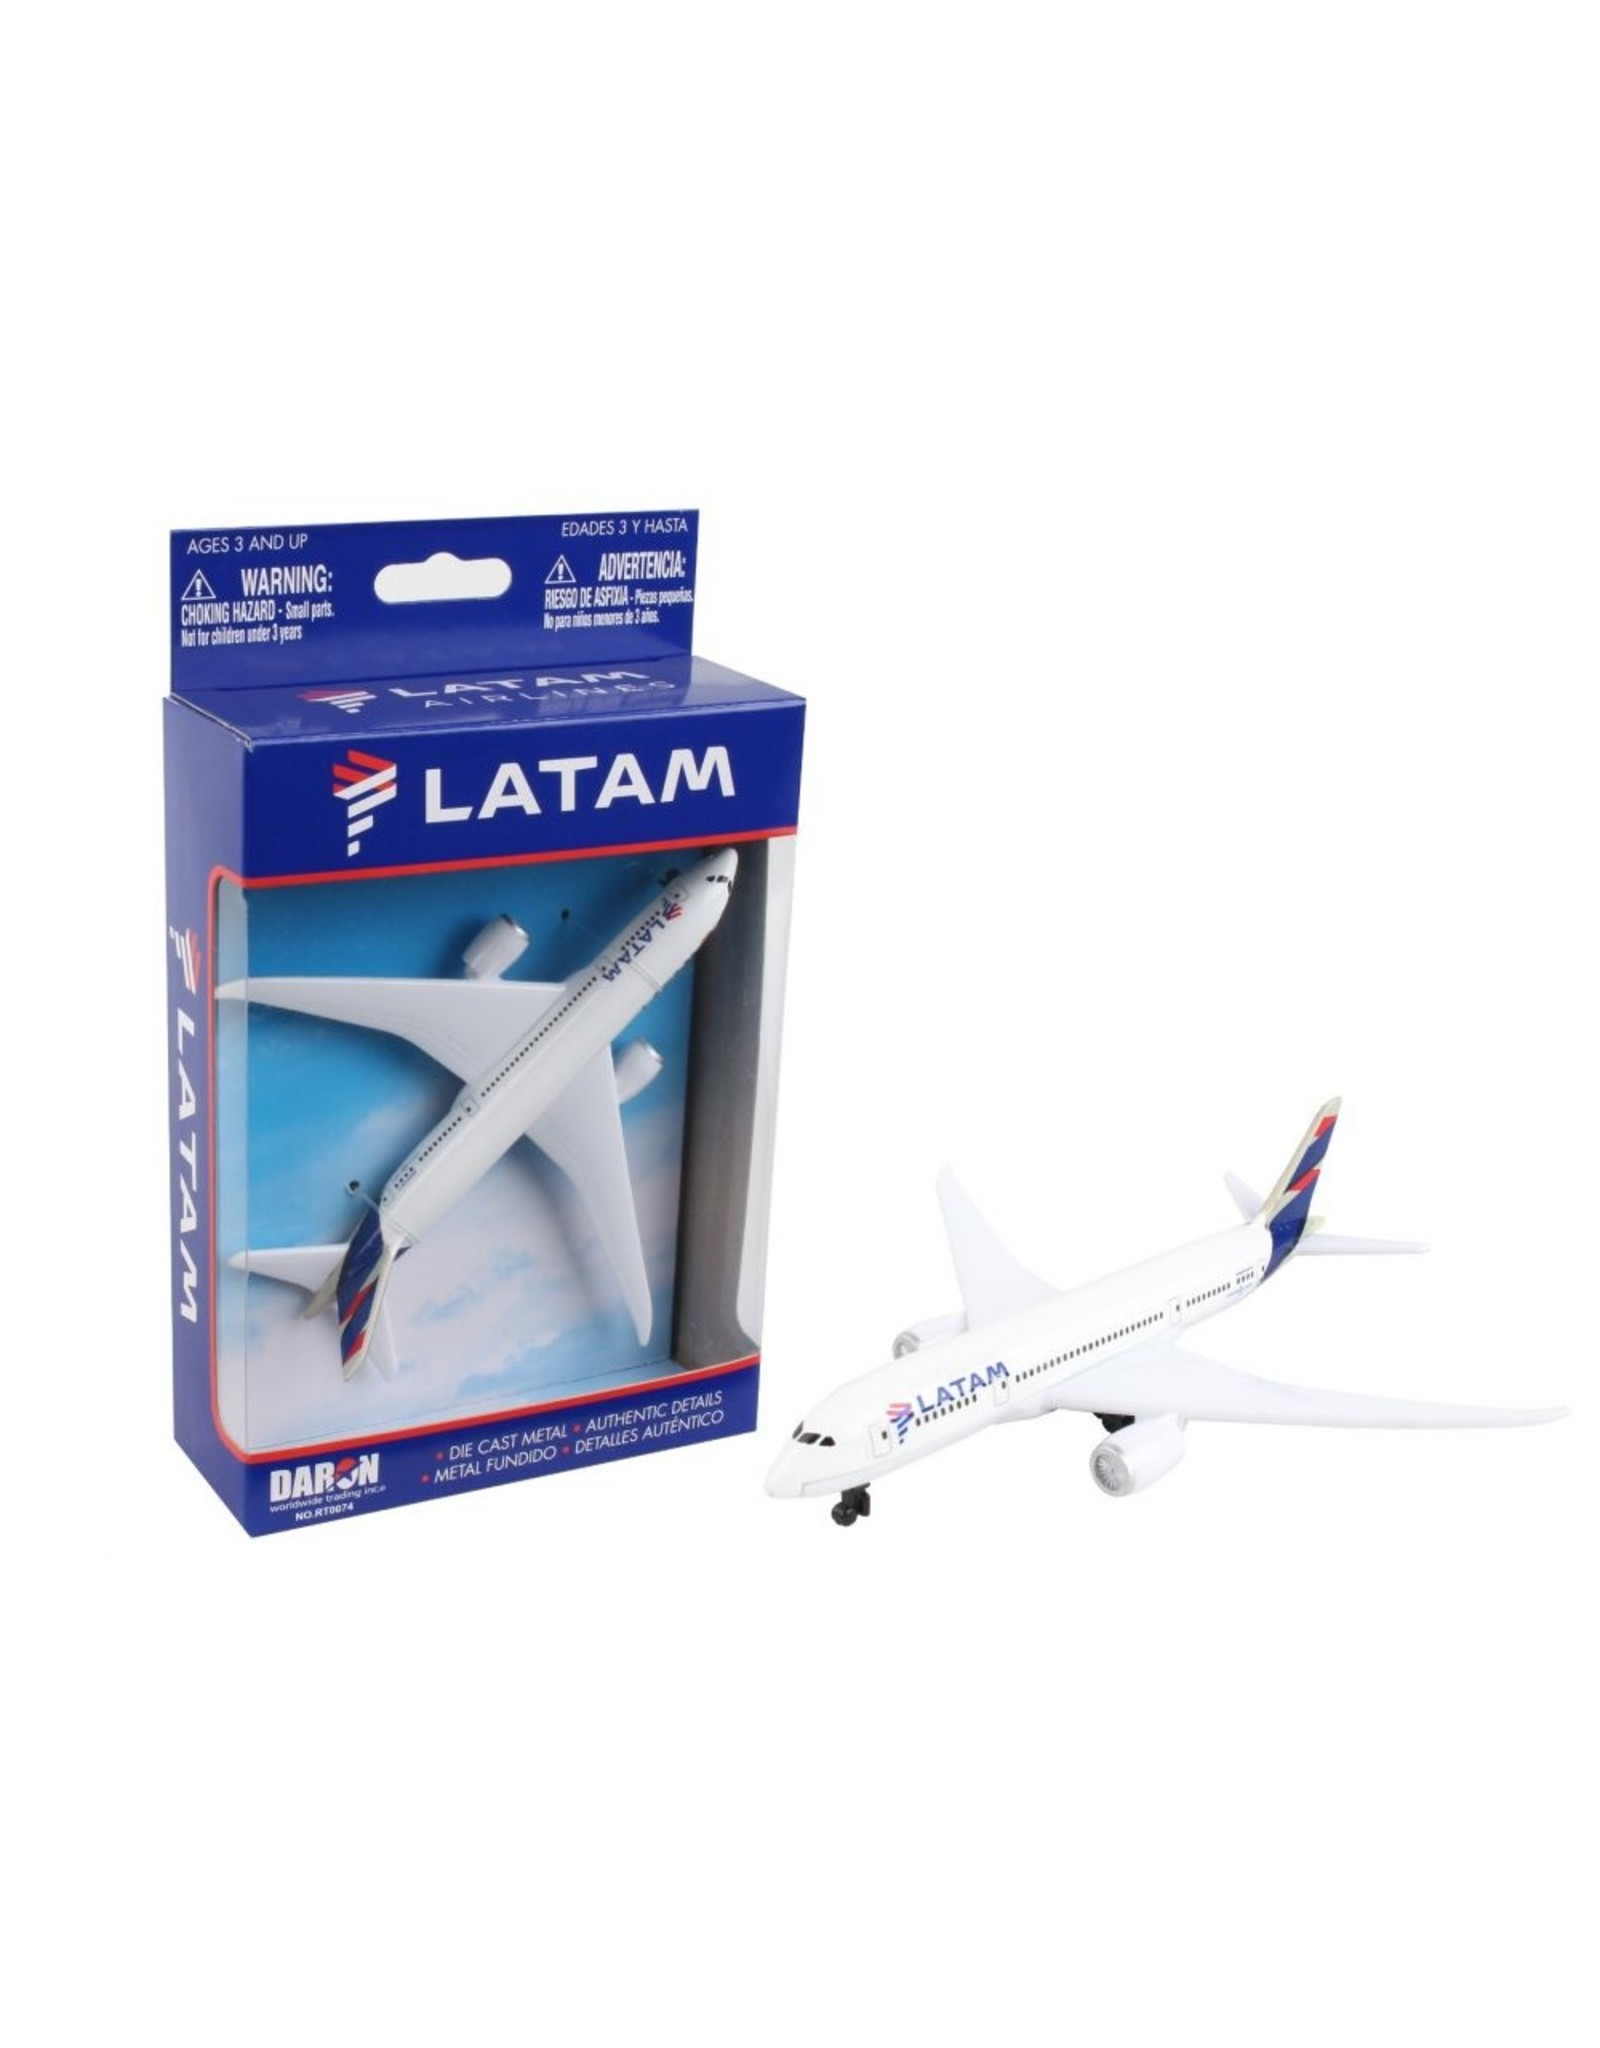 Single Plane Latam